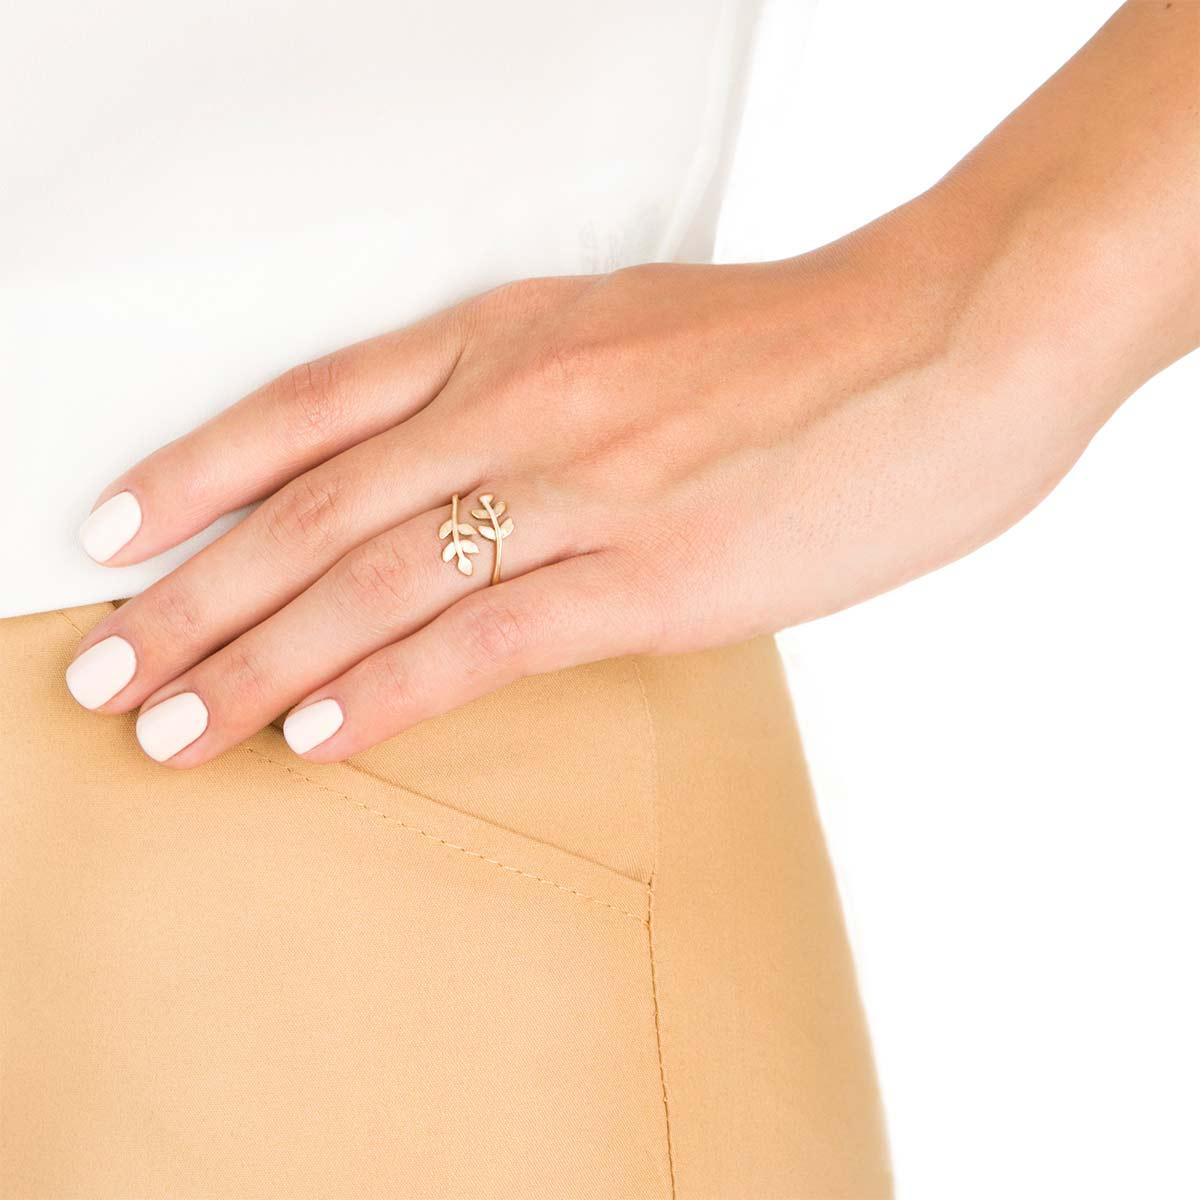 انگشتر طلا برگ زیتون کوچک